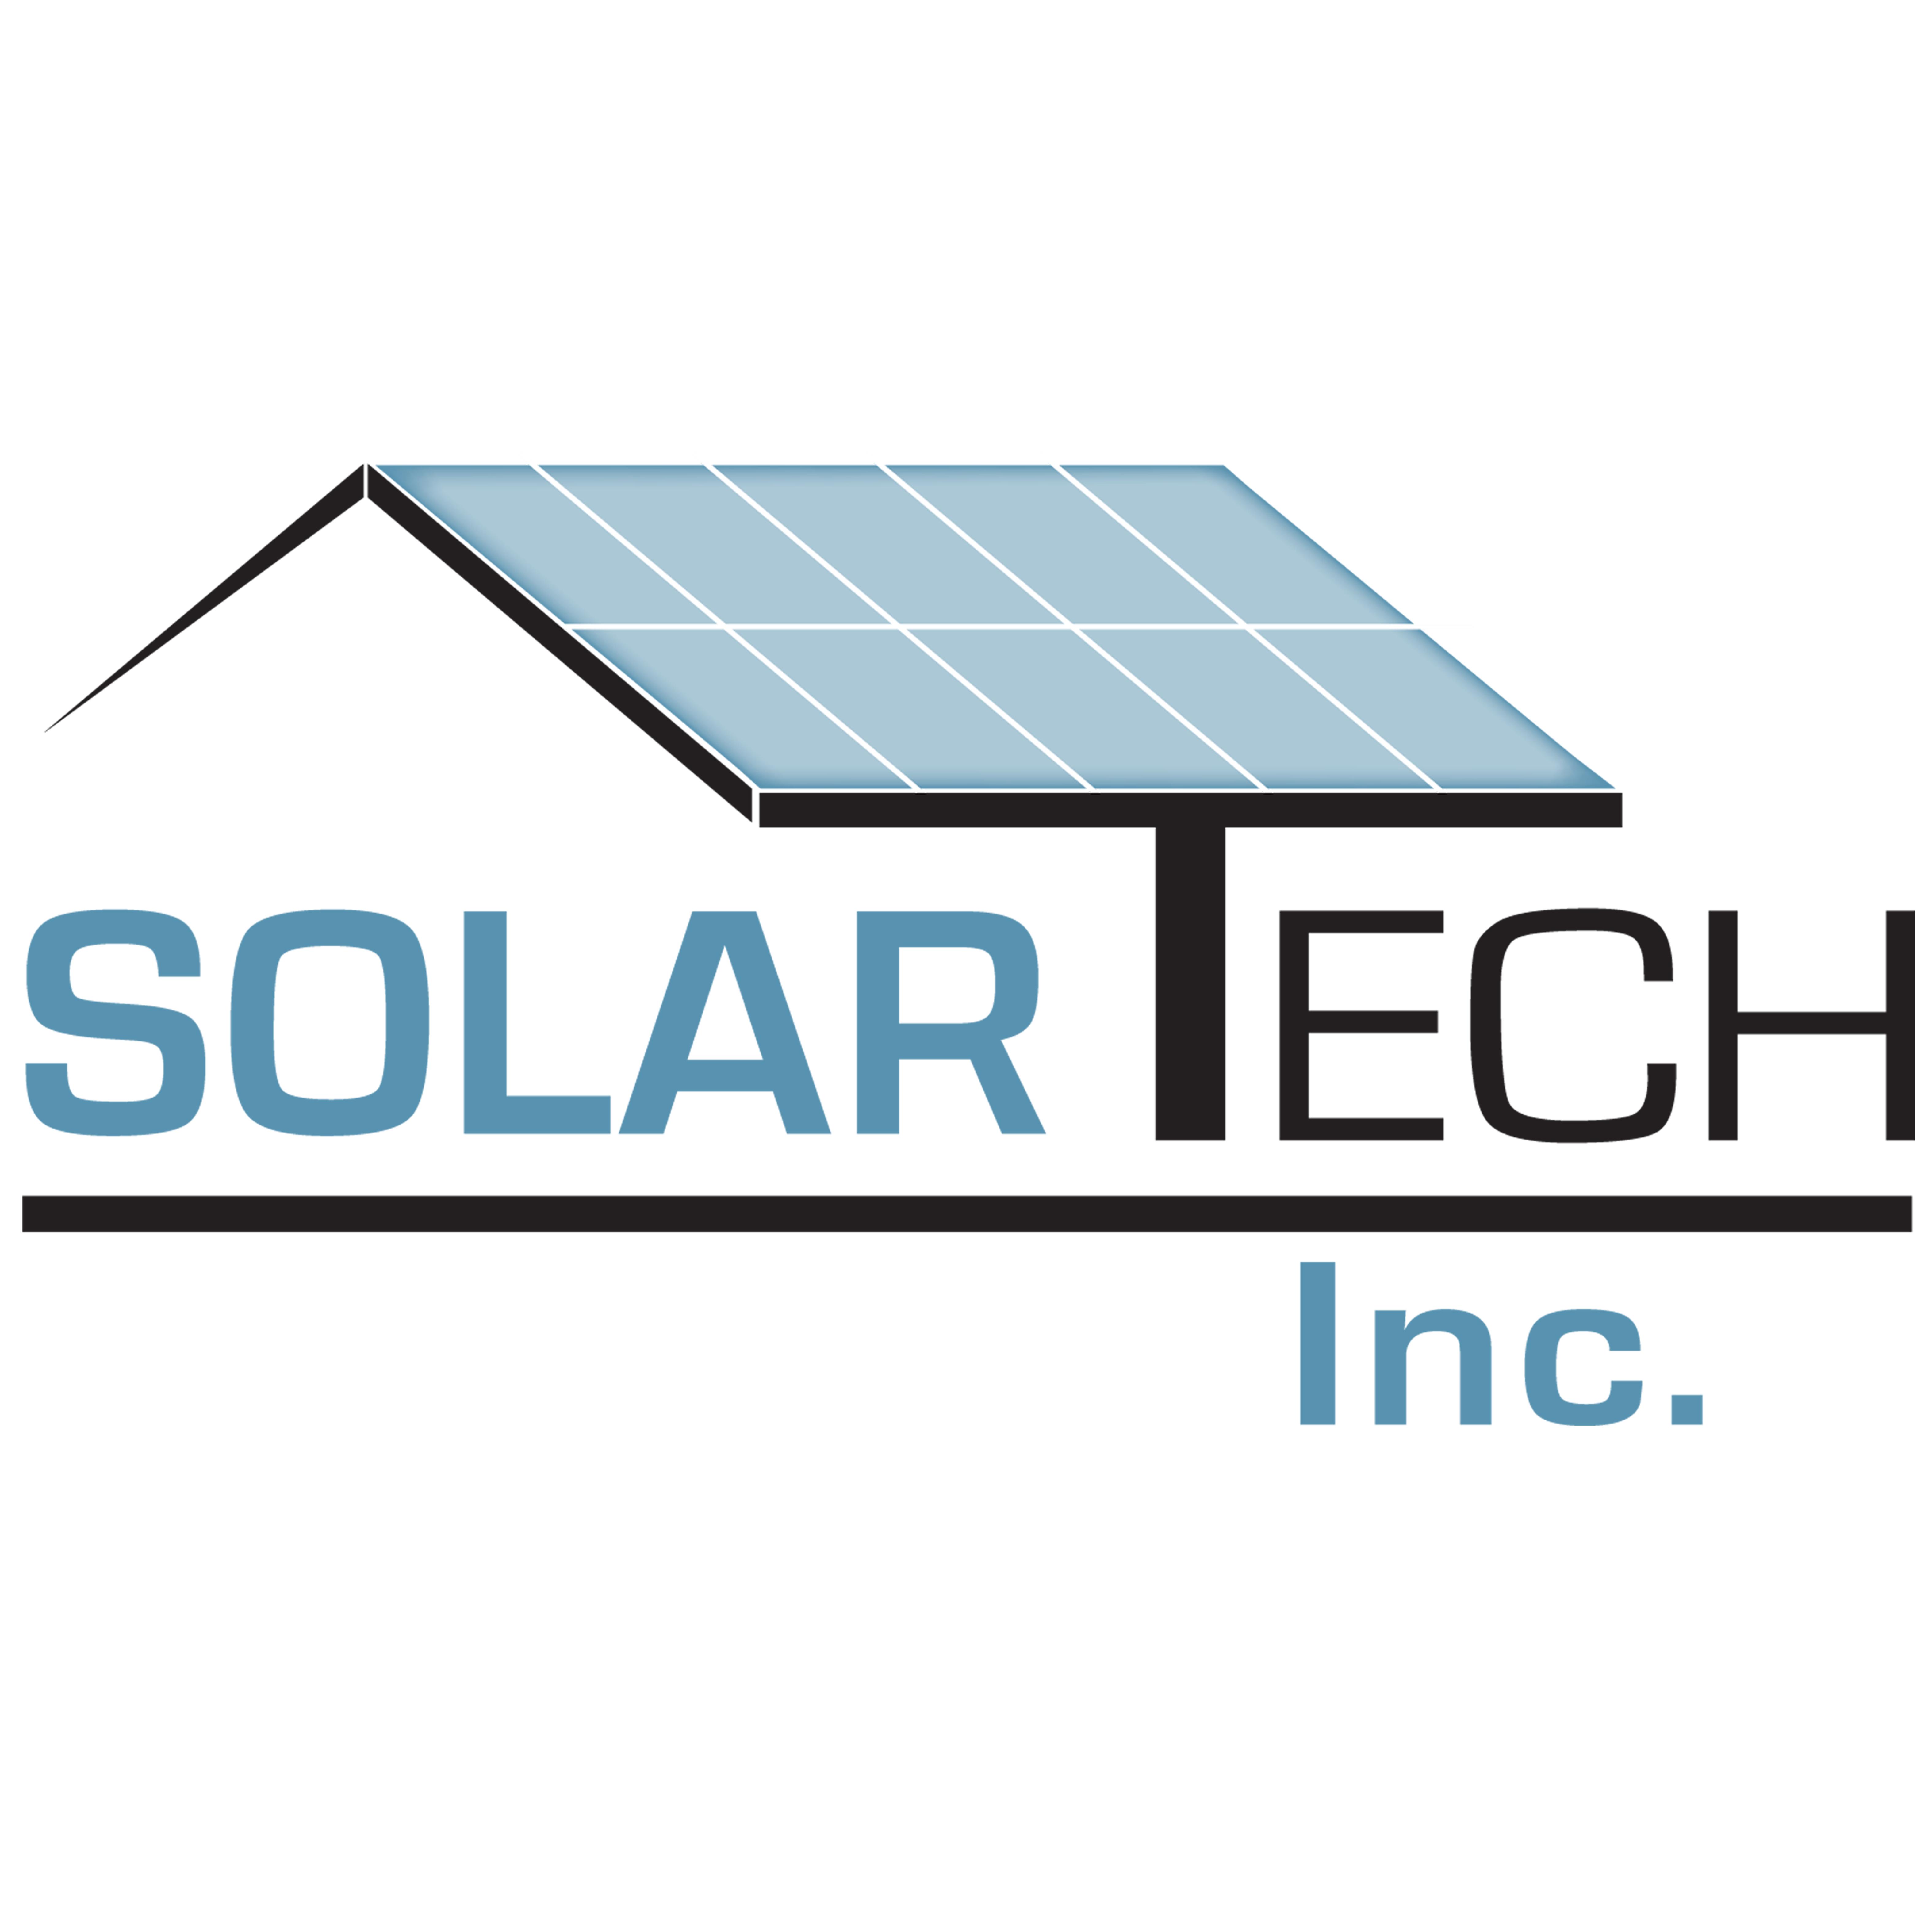 Solar Tech Inc.